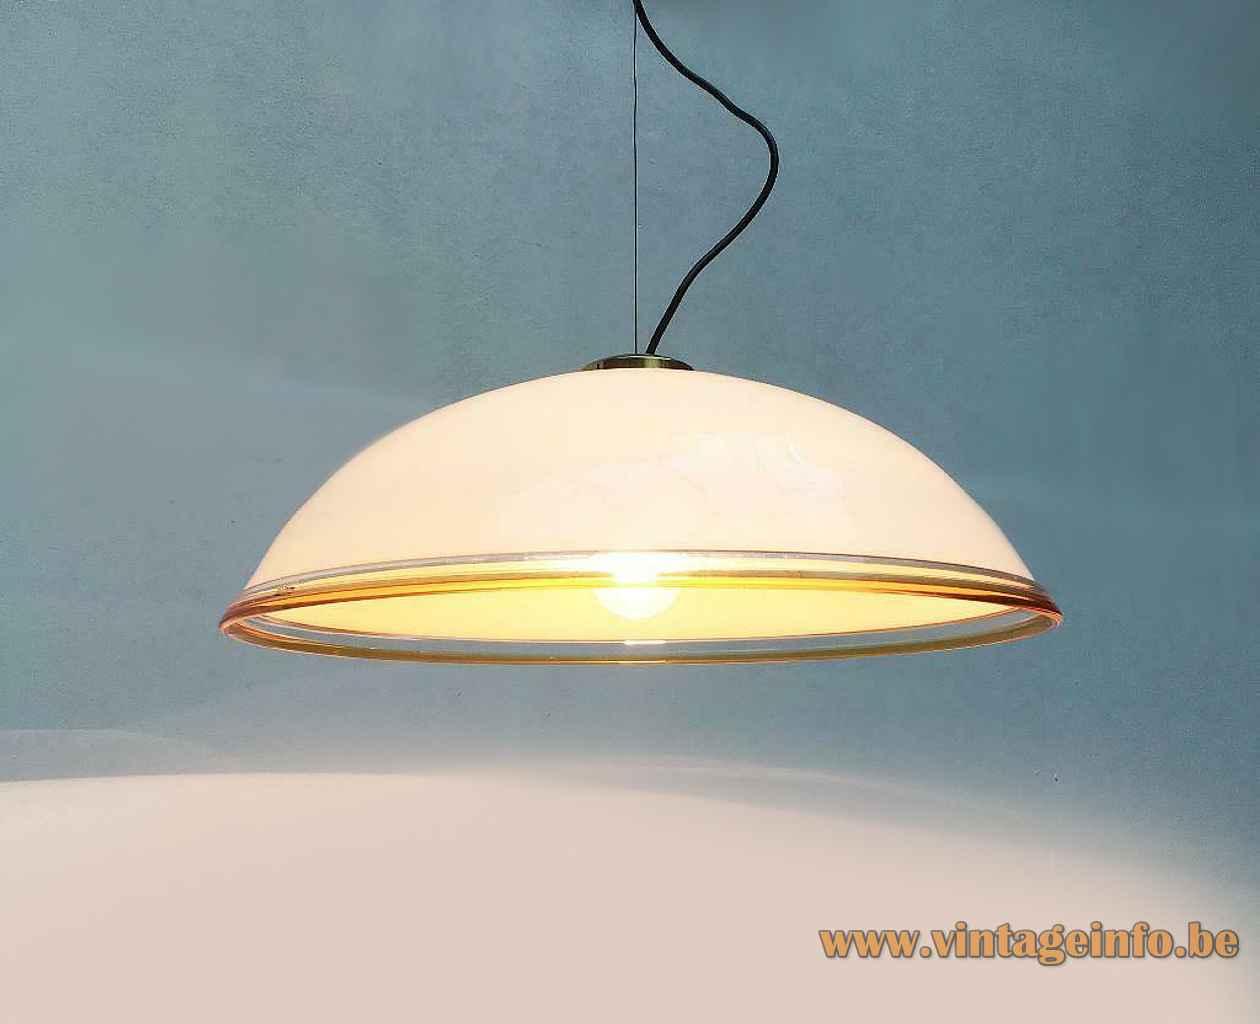 Vetrofond Glass pendant lamp hand-blown white opal mushroom lampshade clear & yellow rim 1980s Italy E27 socket